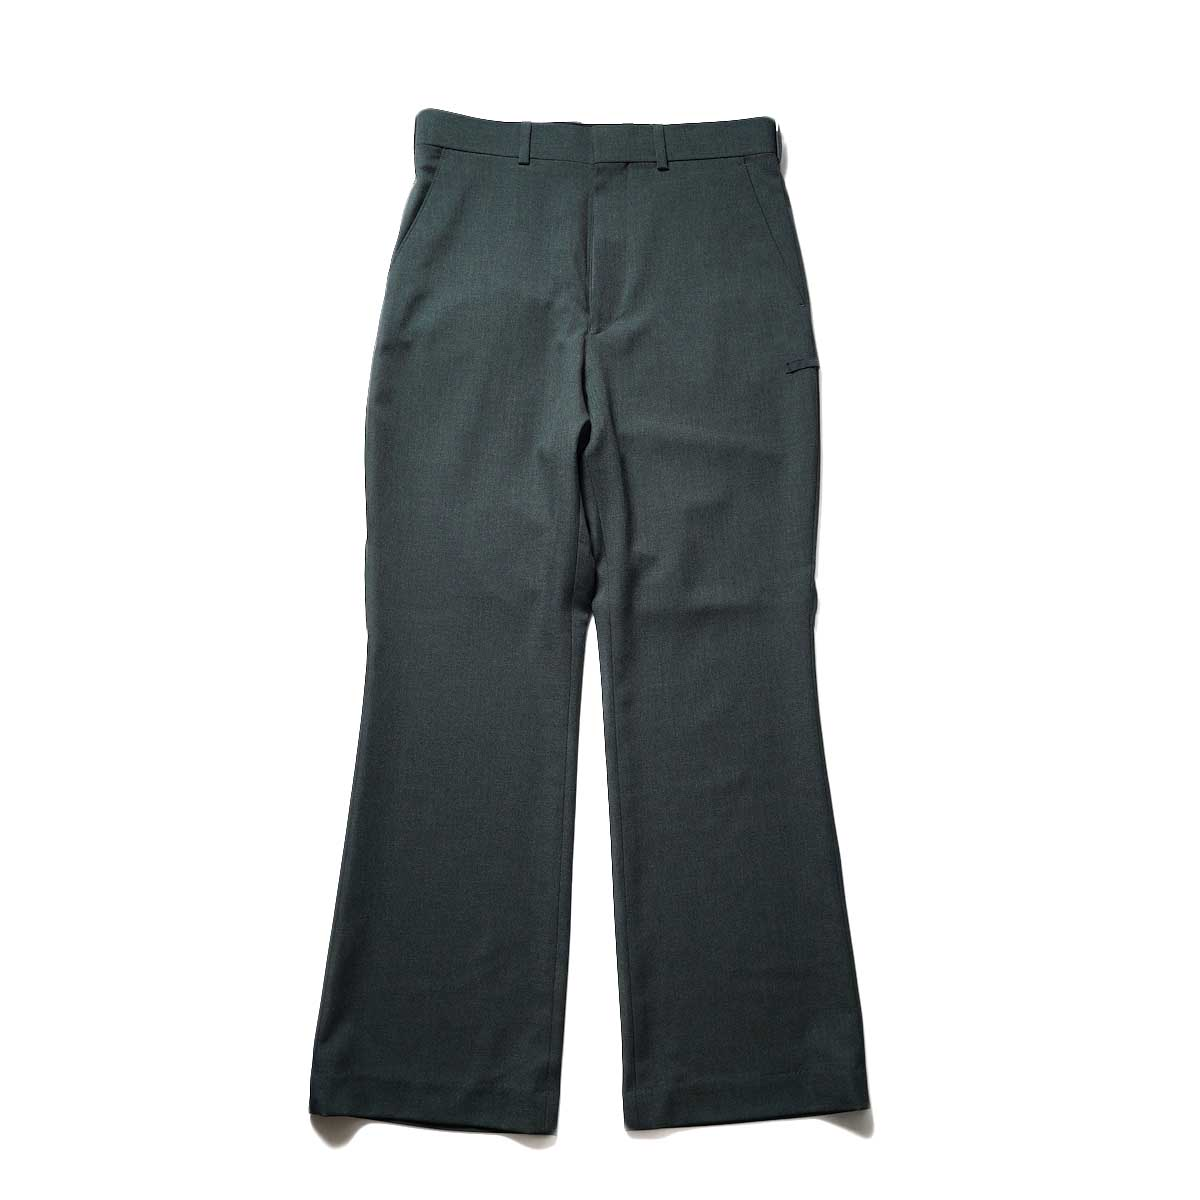 N.HOOLYWOOD / 2212-PT21-008 Flair Slacks (Charcoal)正面